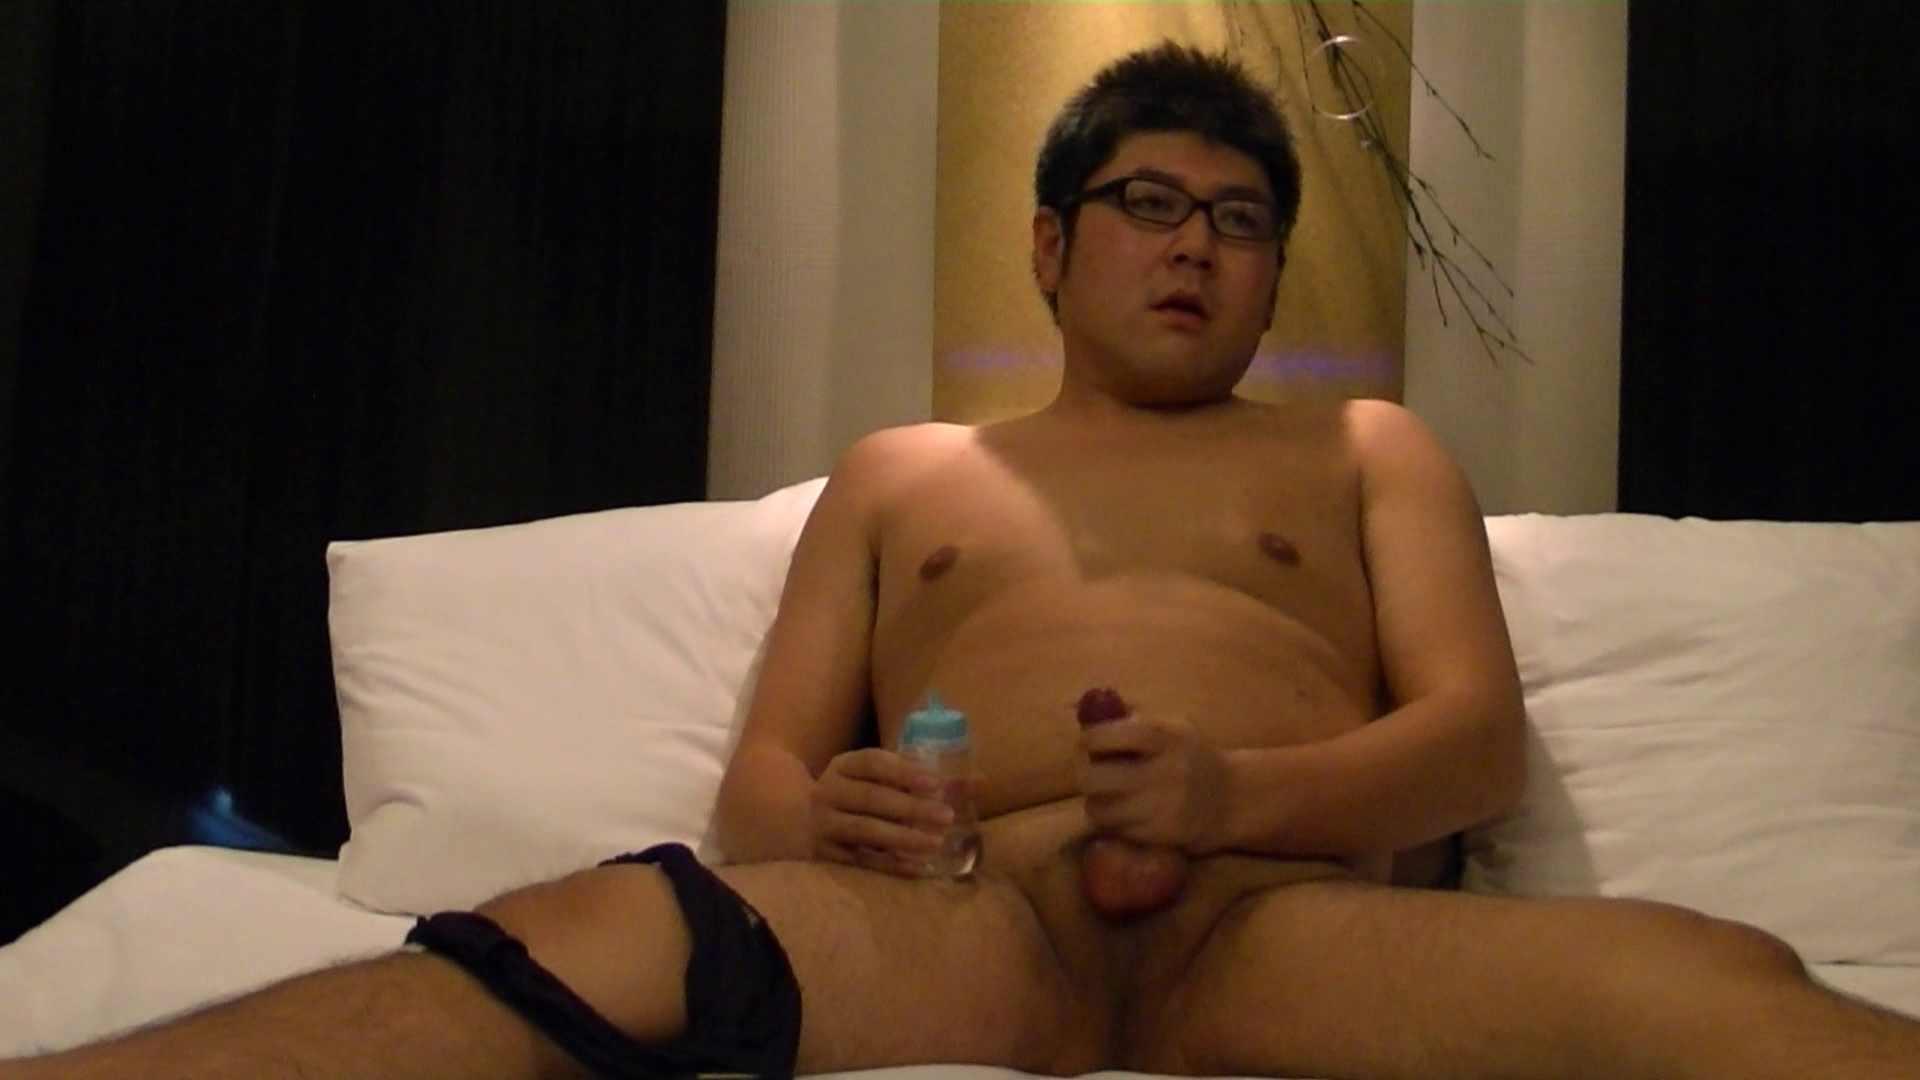 Mr.オナックスさん投稿!HD 貴方のオナニー三万円で撮影させてください。VOL.02 前編 0 | オナニー特集  72pic 69